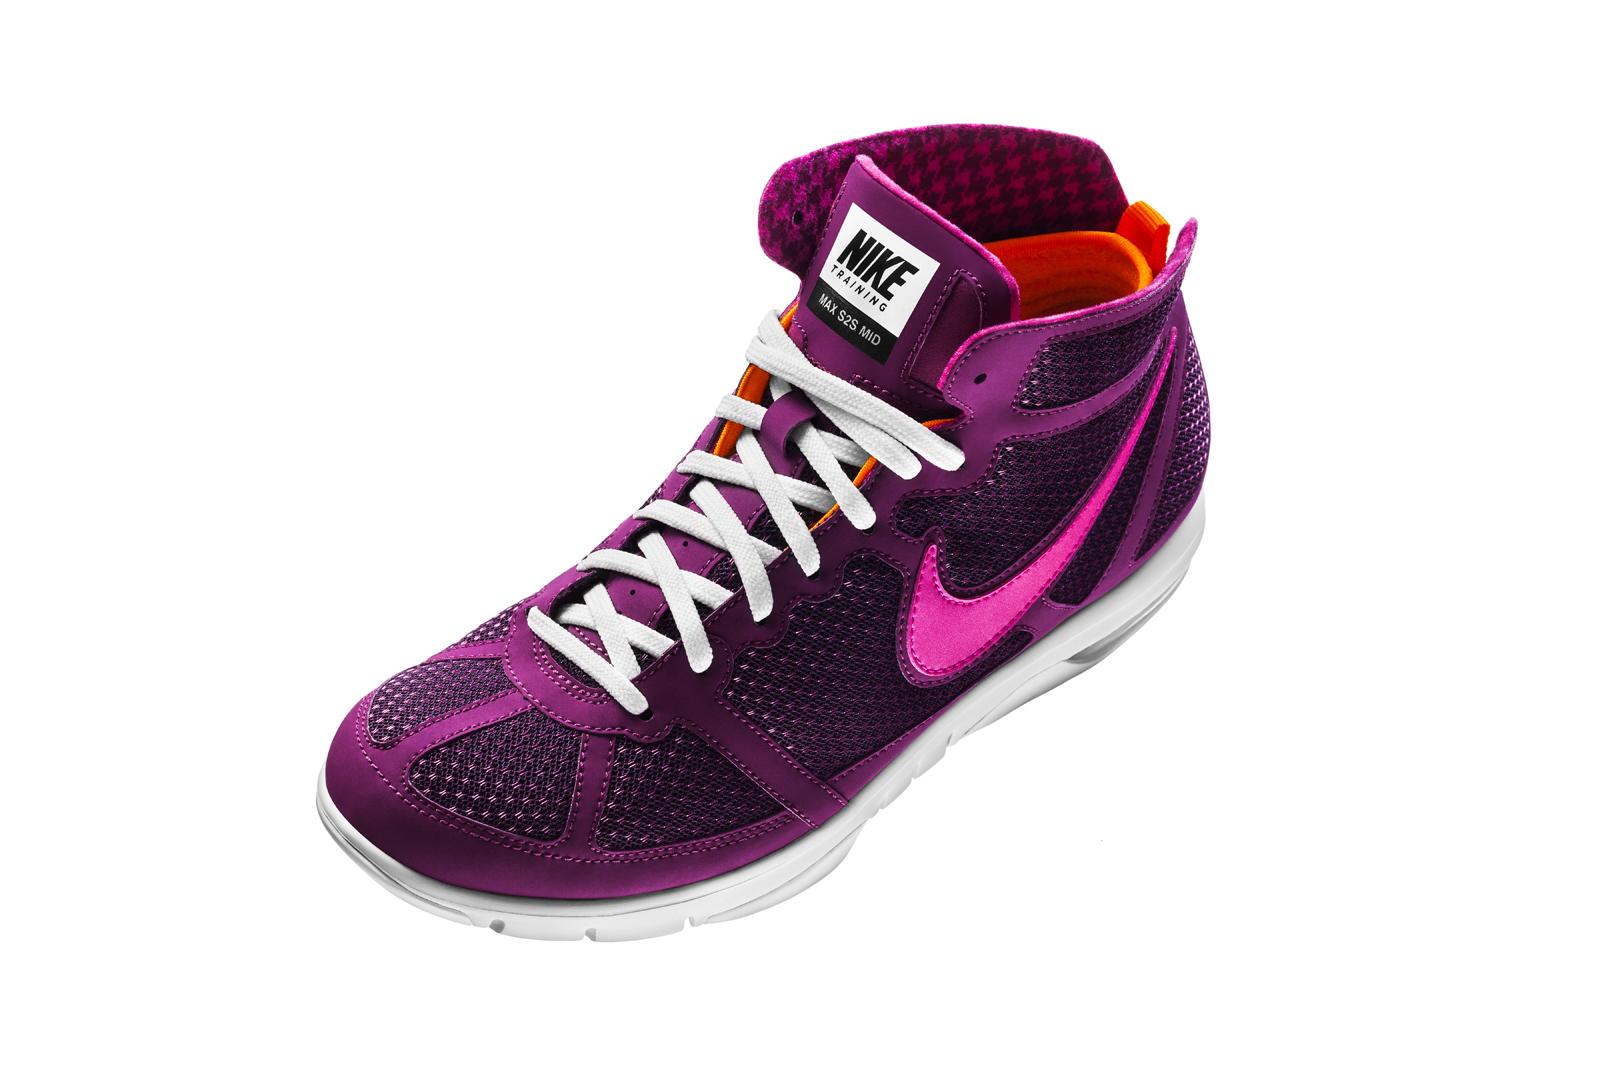 Womens Nike Leopard Shoes